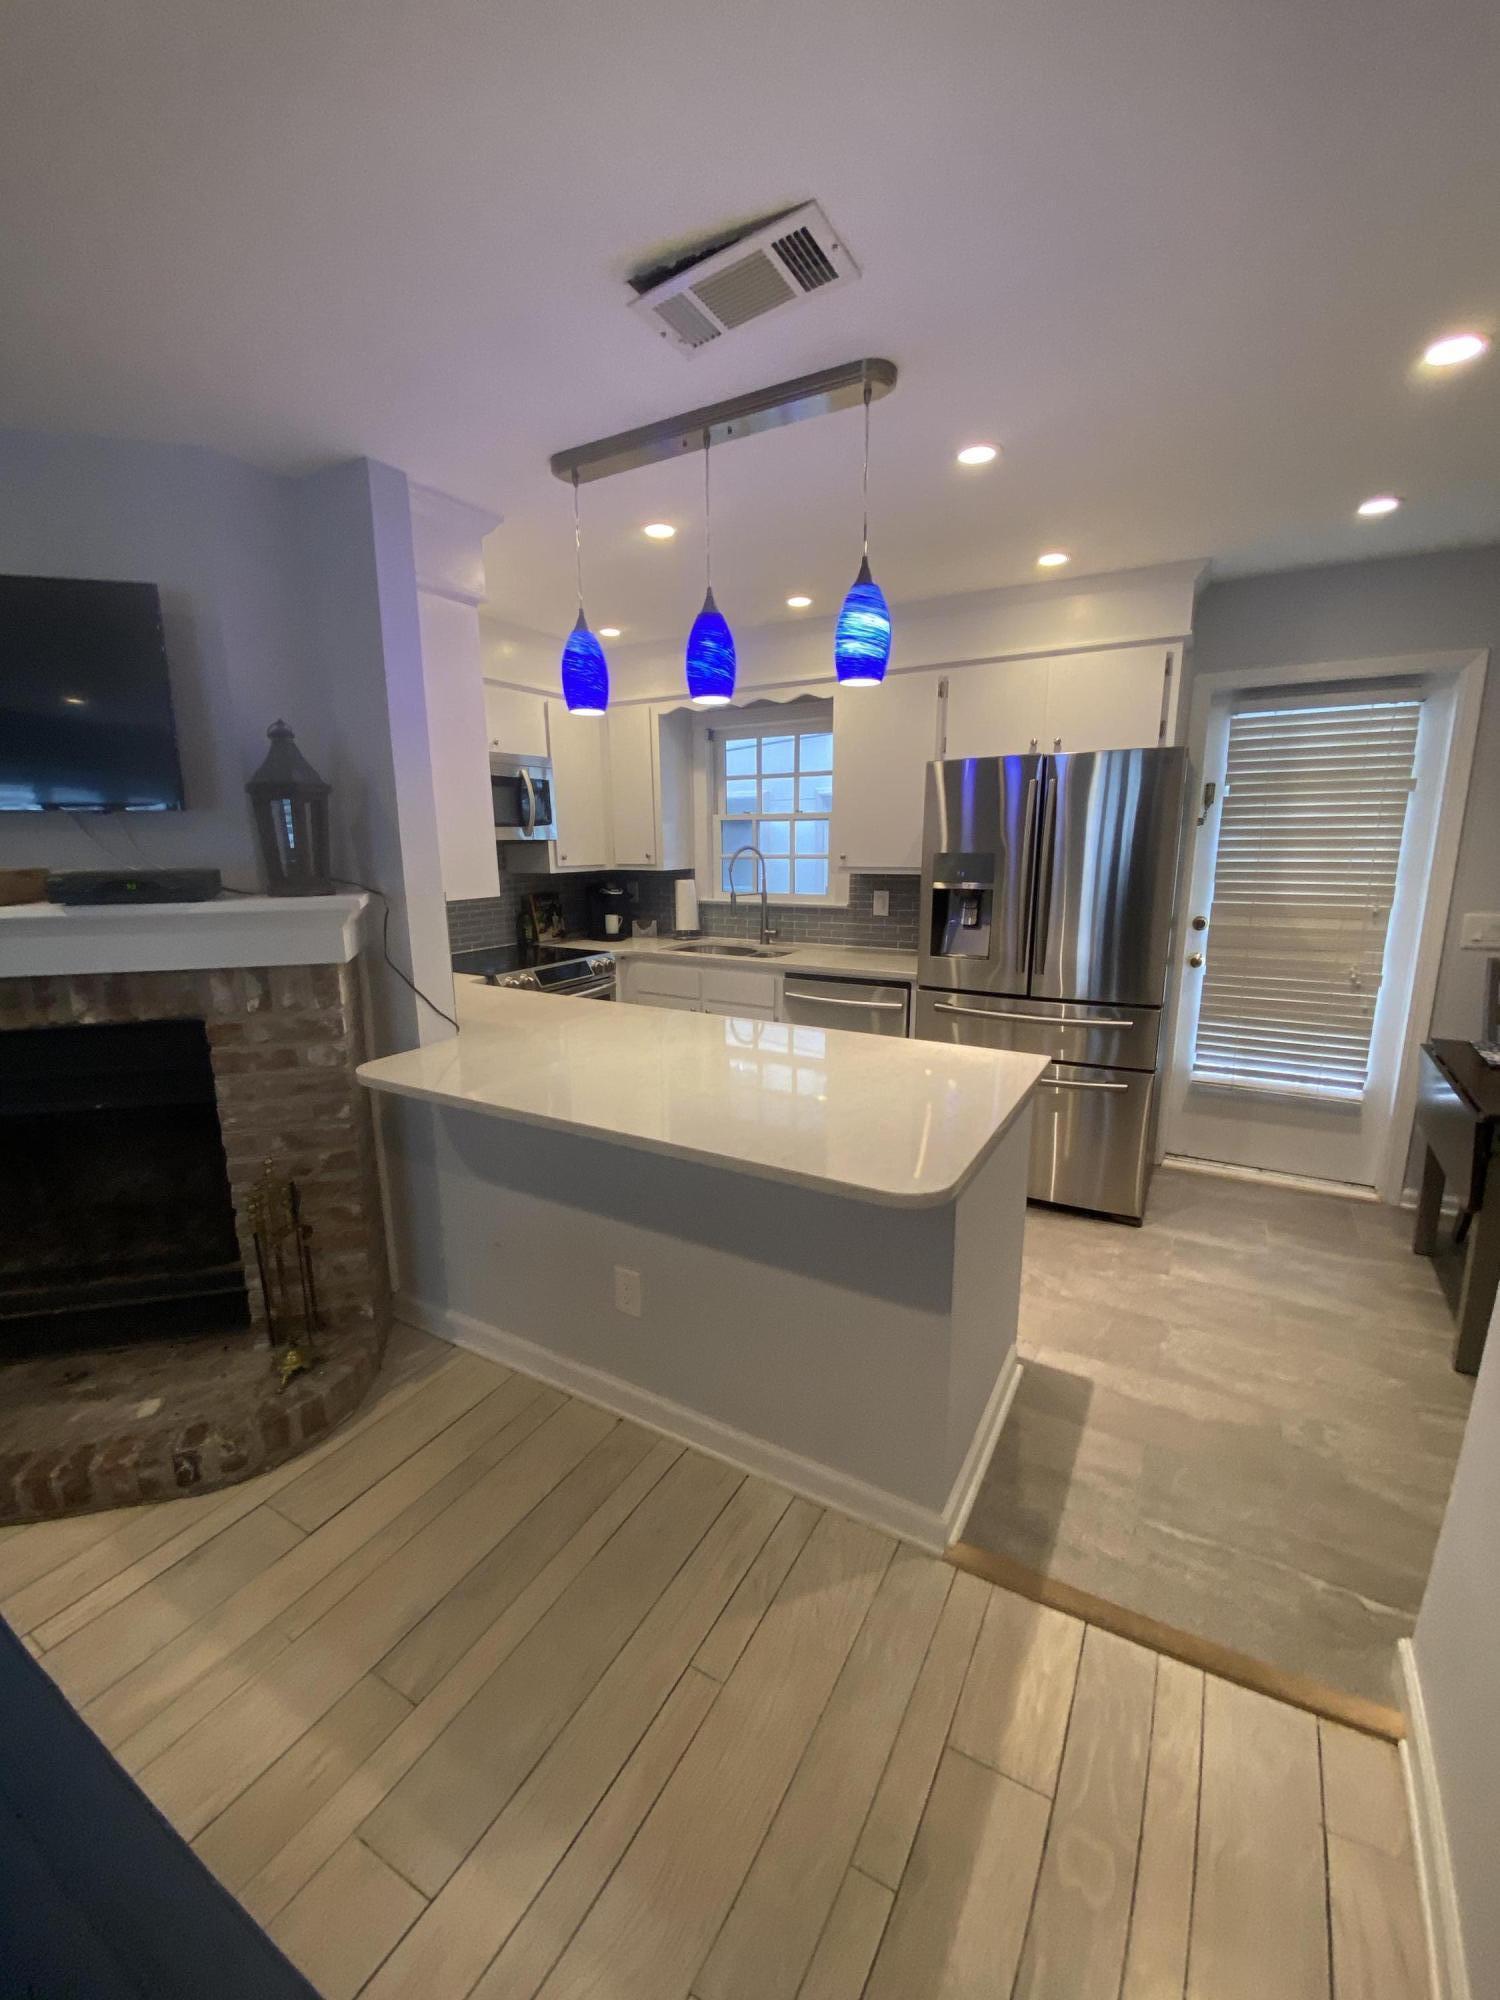 Harleston Village Homes For Sale - 15 Horlbeck, Charleston, SC - 35